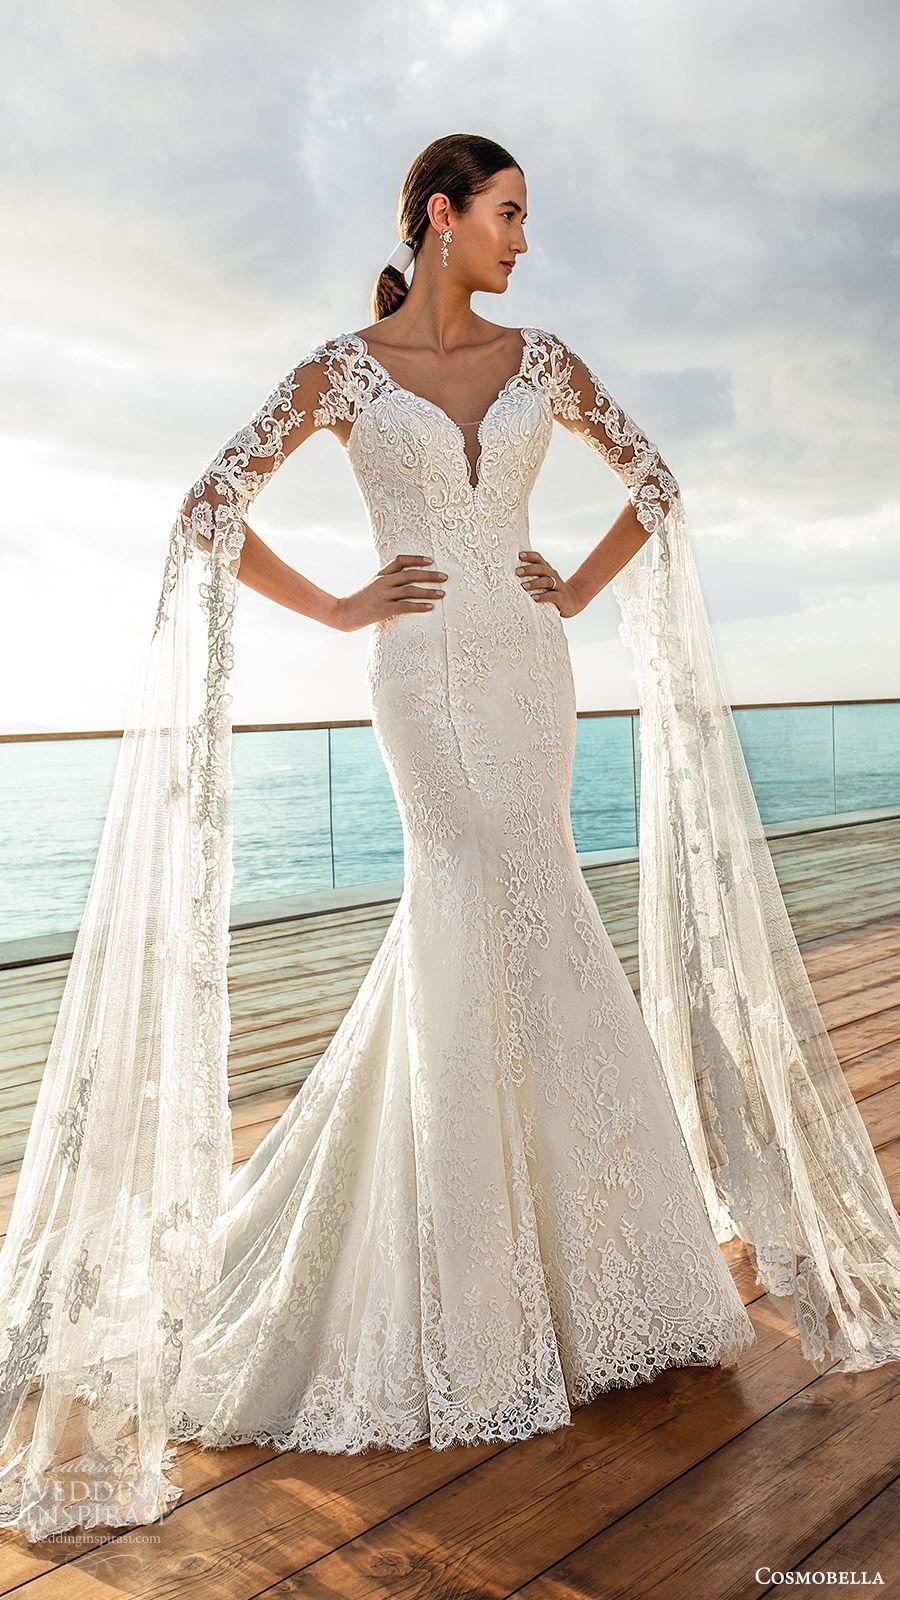 cosmobella 2020 bridal illusion half sleeves detached long split sleeves sweetheart neckline fully embellished lace fit flare trumpet mermaid wedding dress (6) romantic vintage chapel train mv